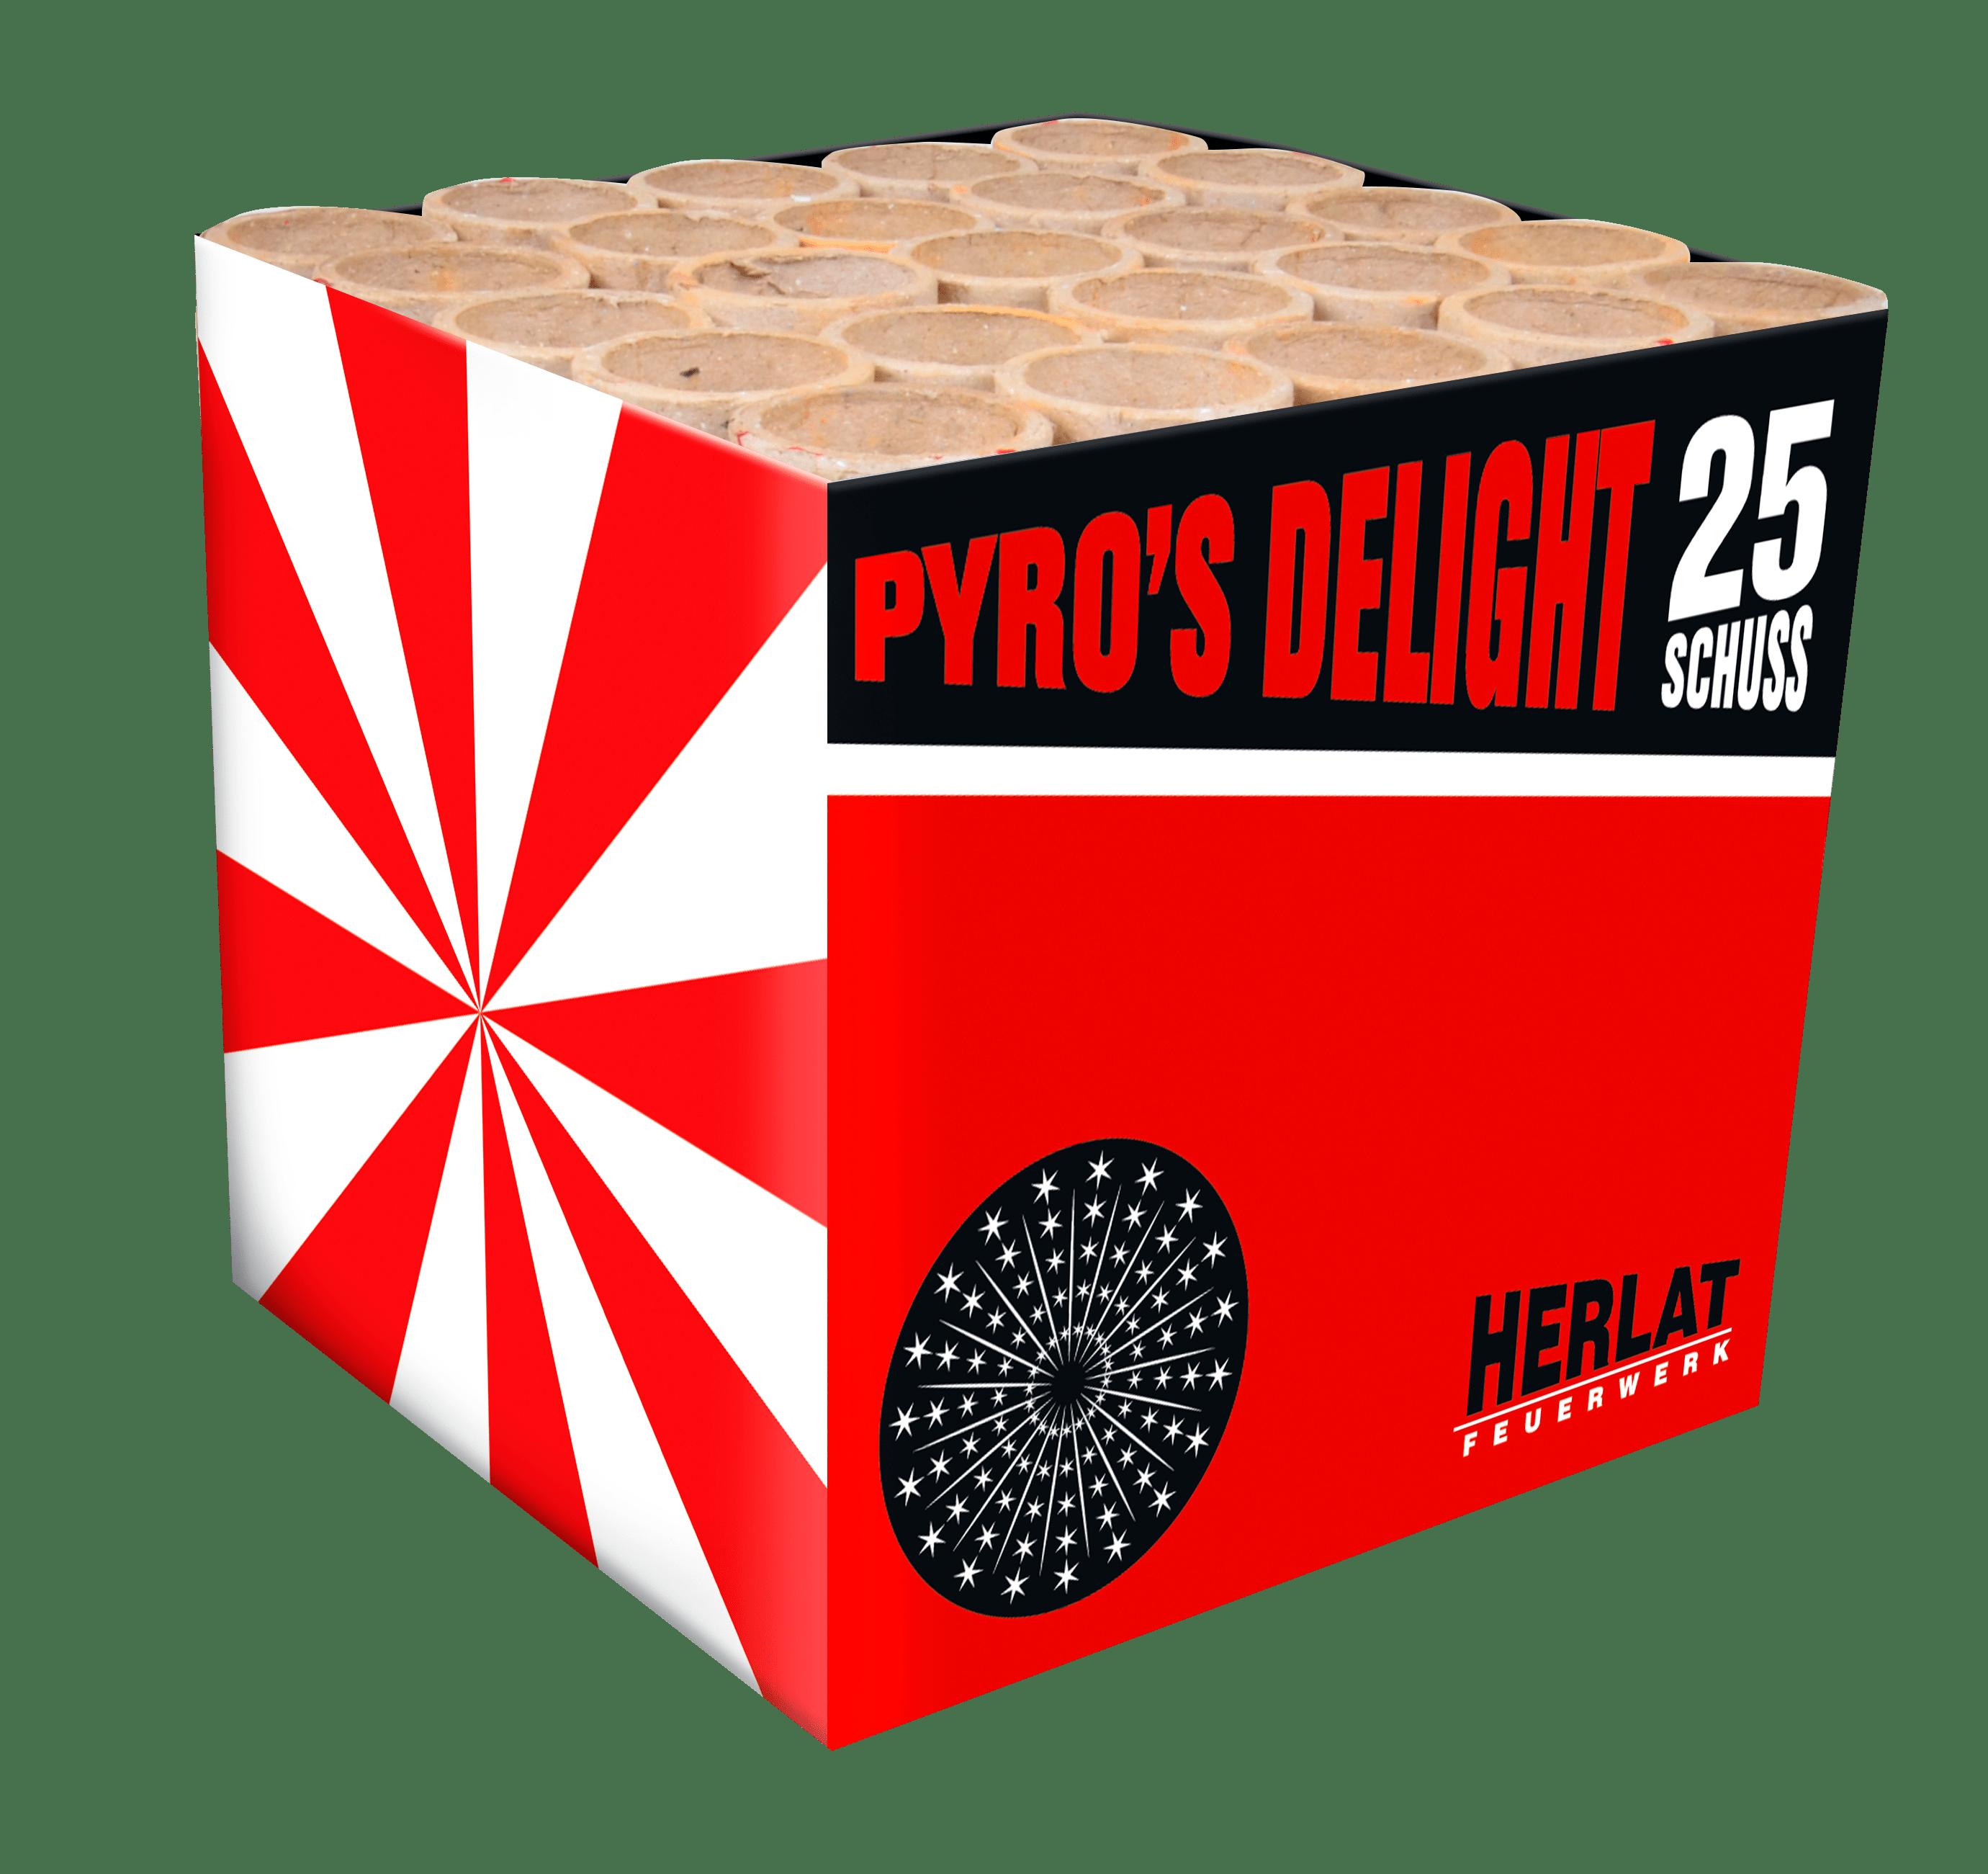 Pyro's Delight**